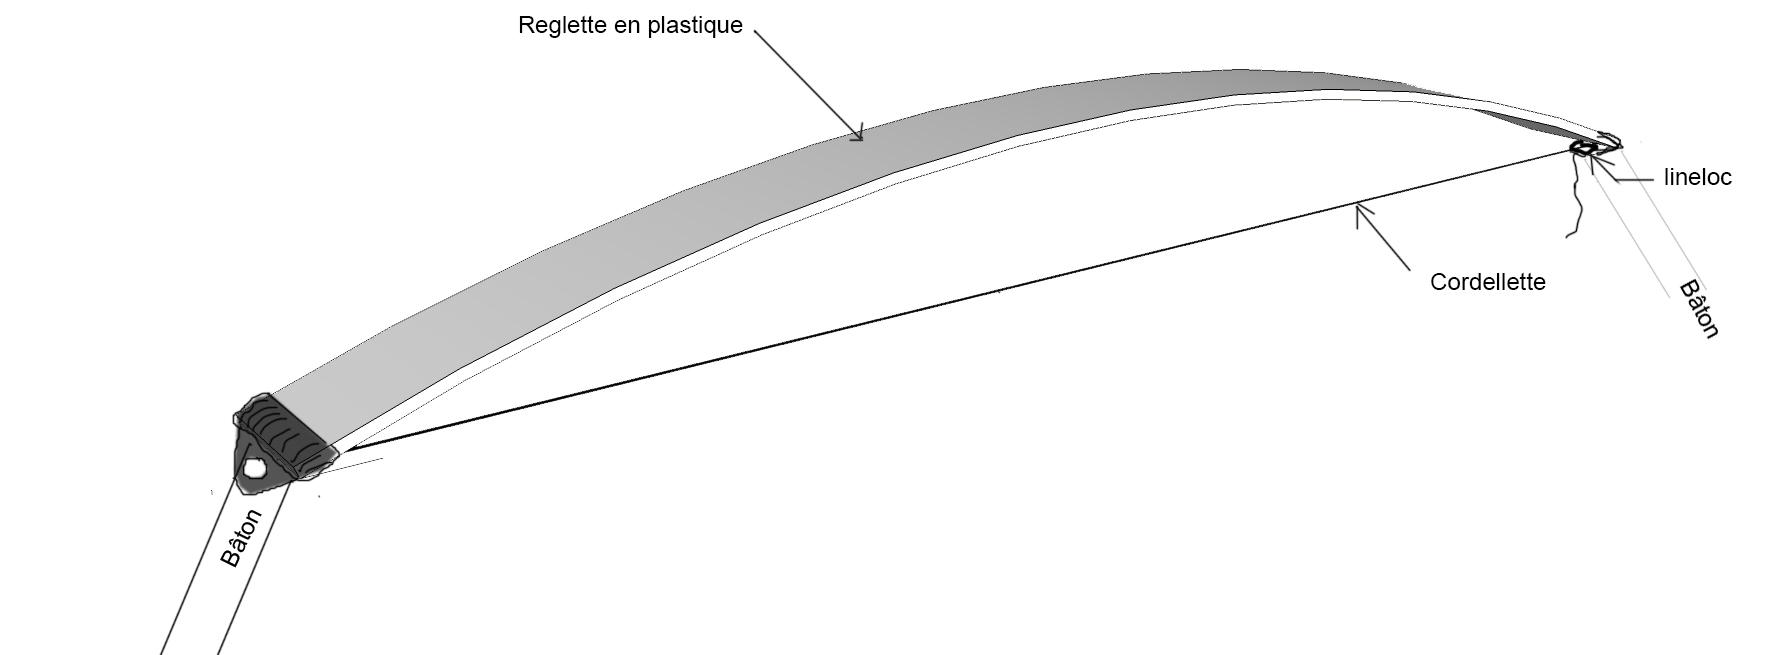 7916_principe_reglette_06-05-14.jpg